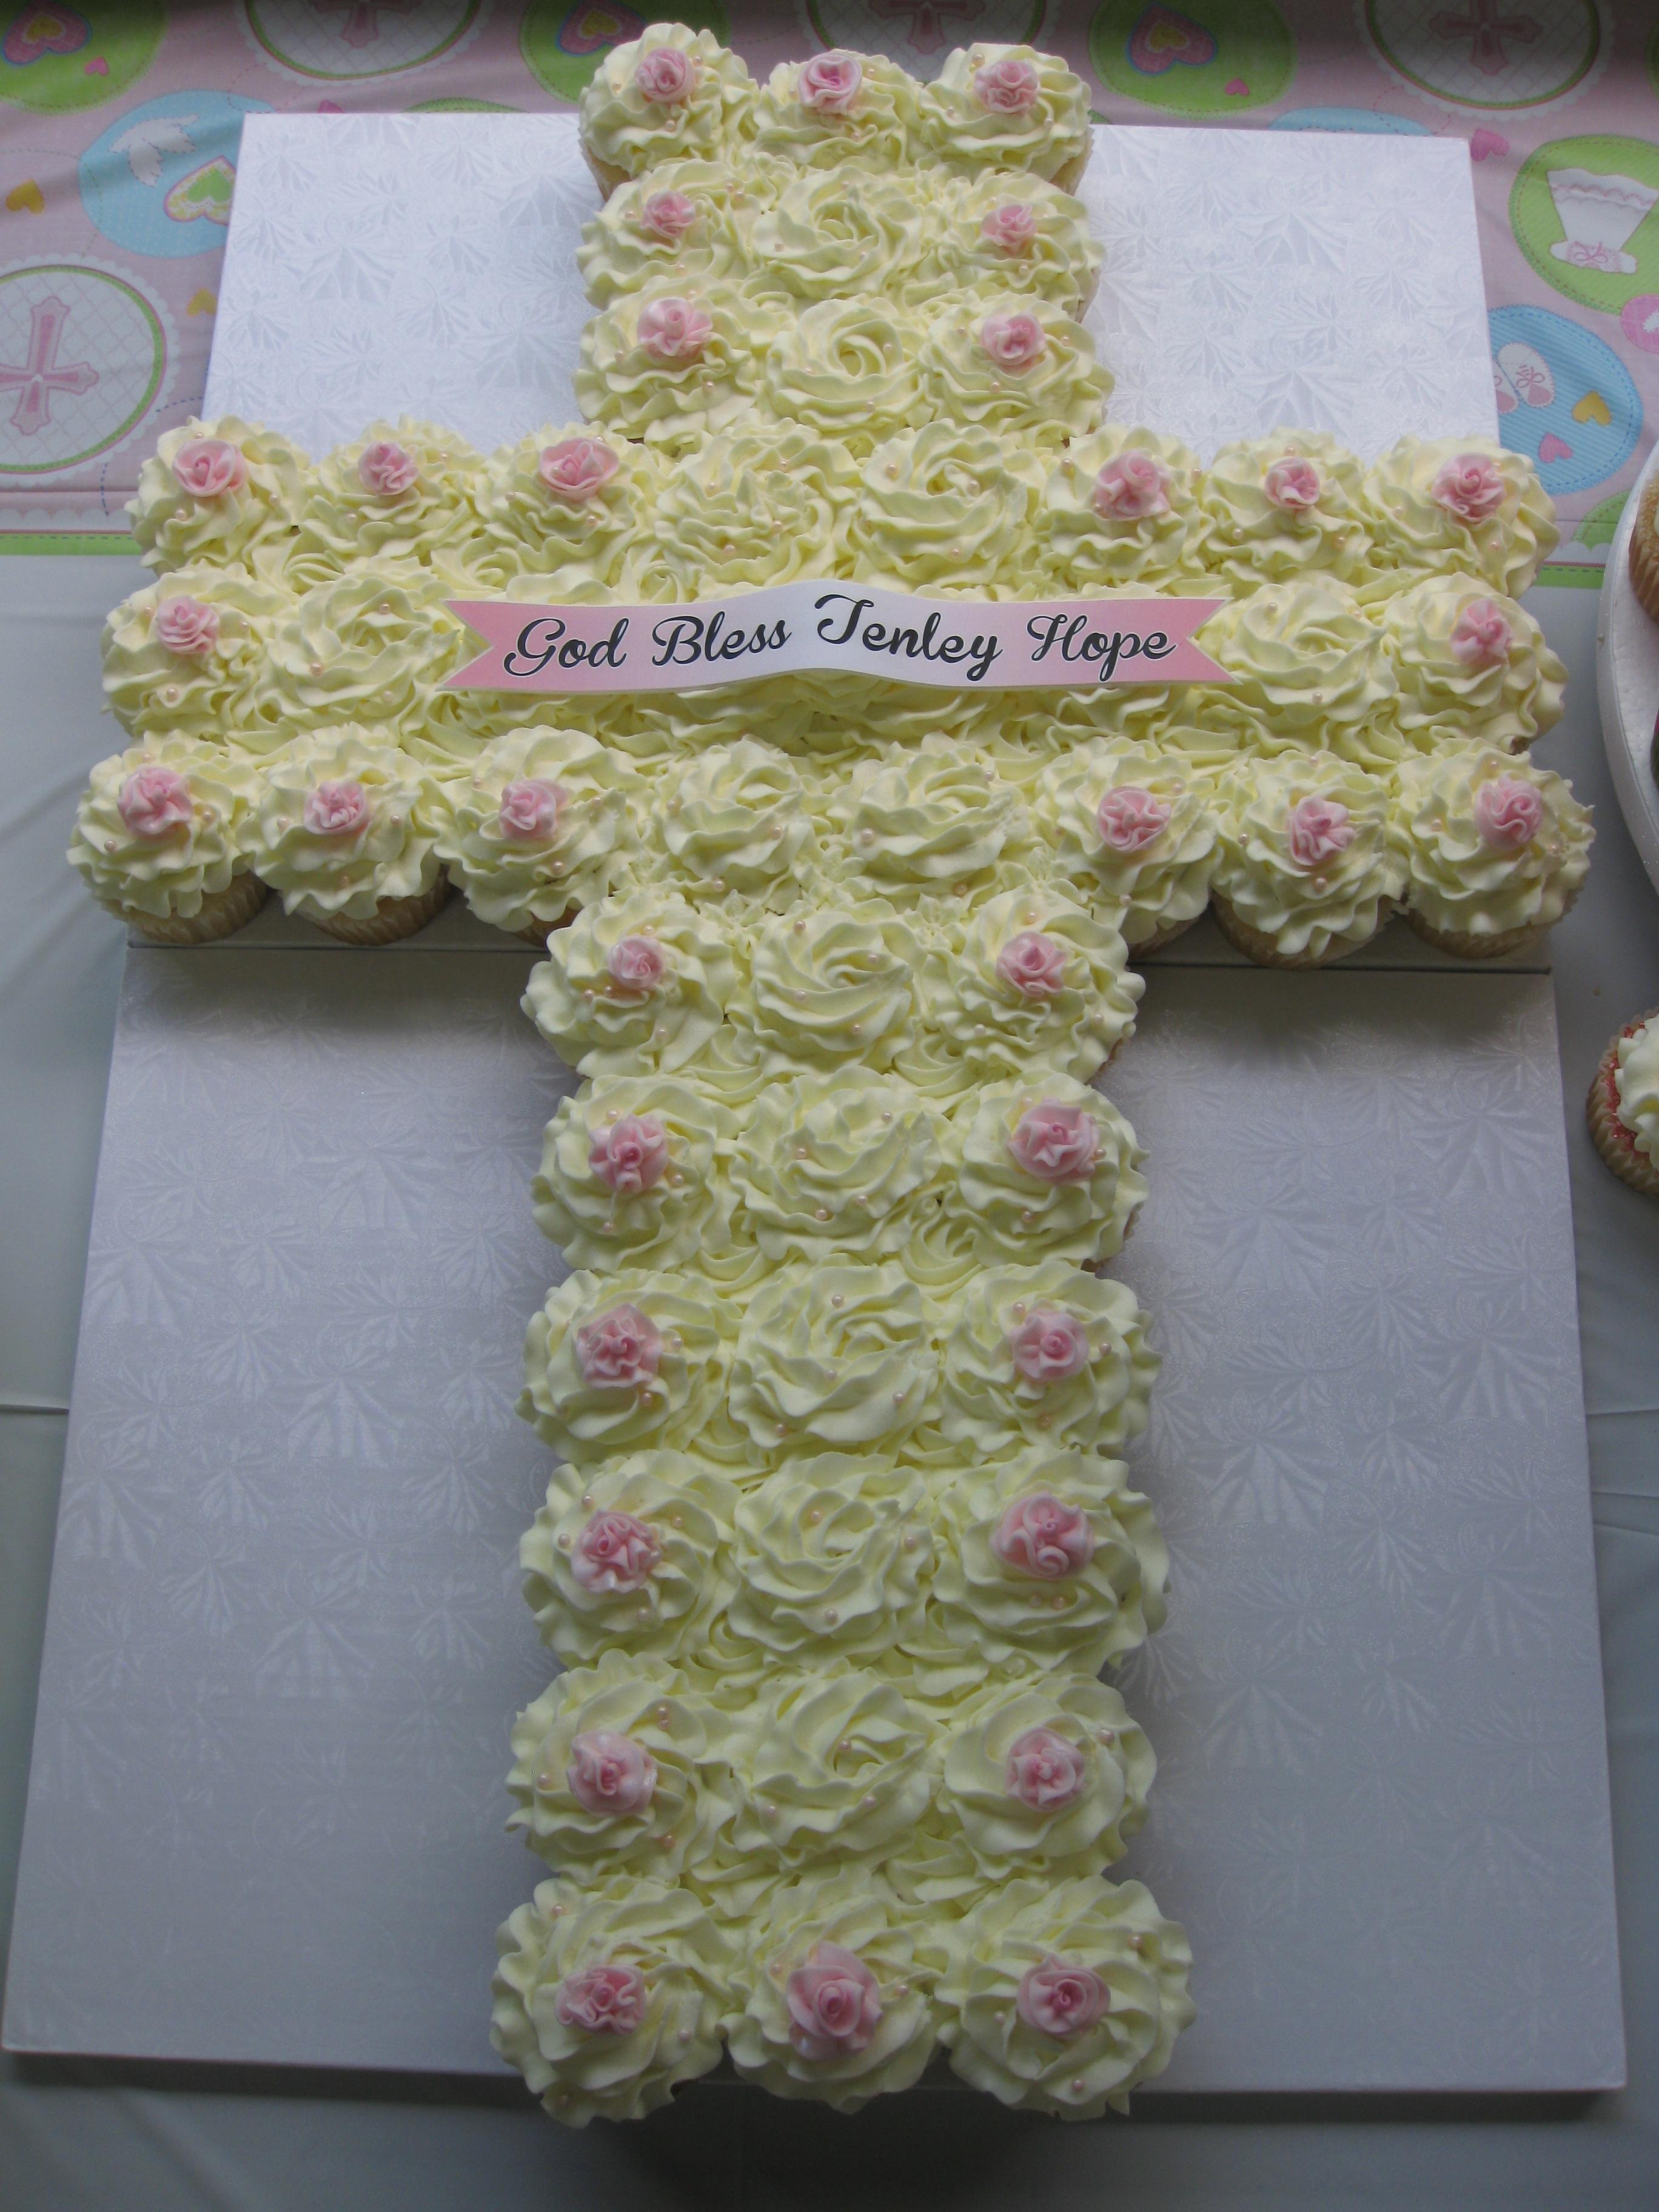 900_704067m5ta_baptism-cupcake-cross-with-fondant-roses-and-edible-banner.jpg